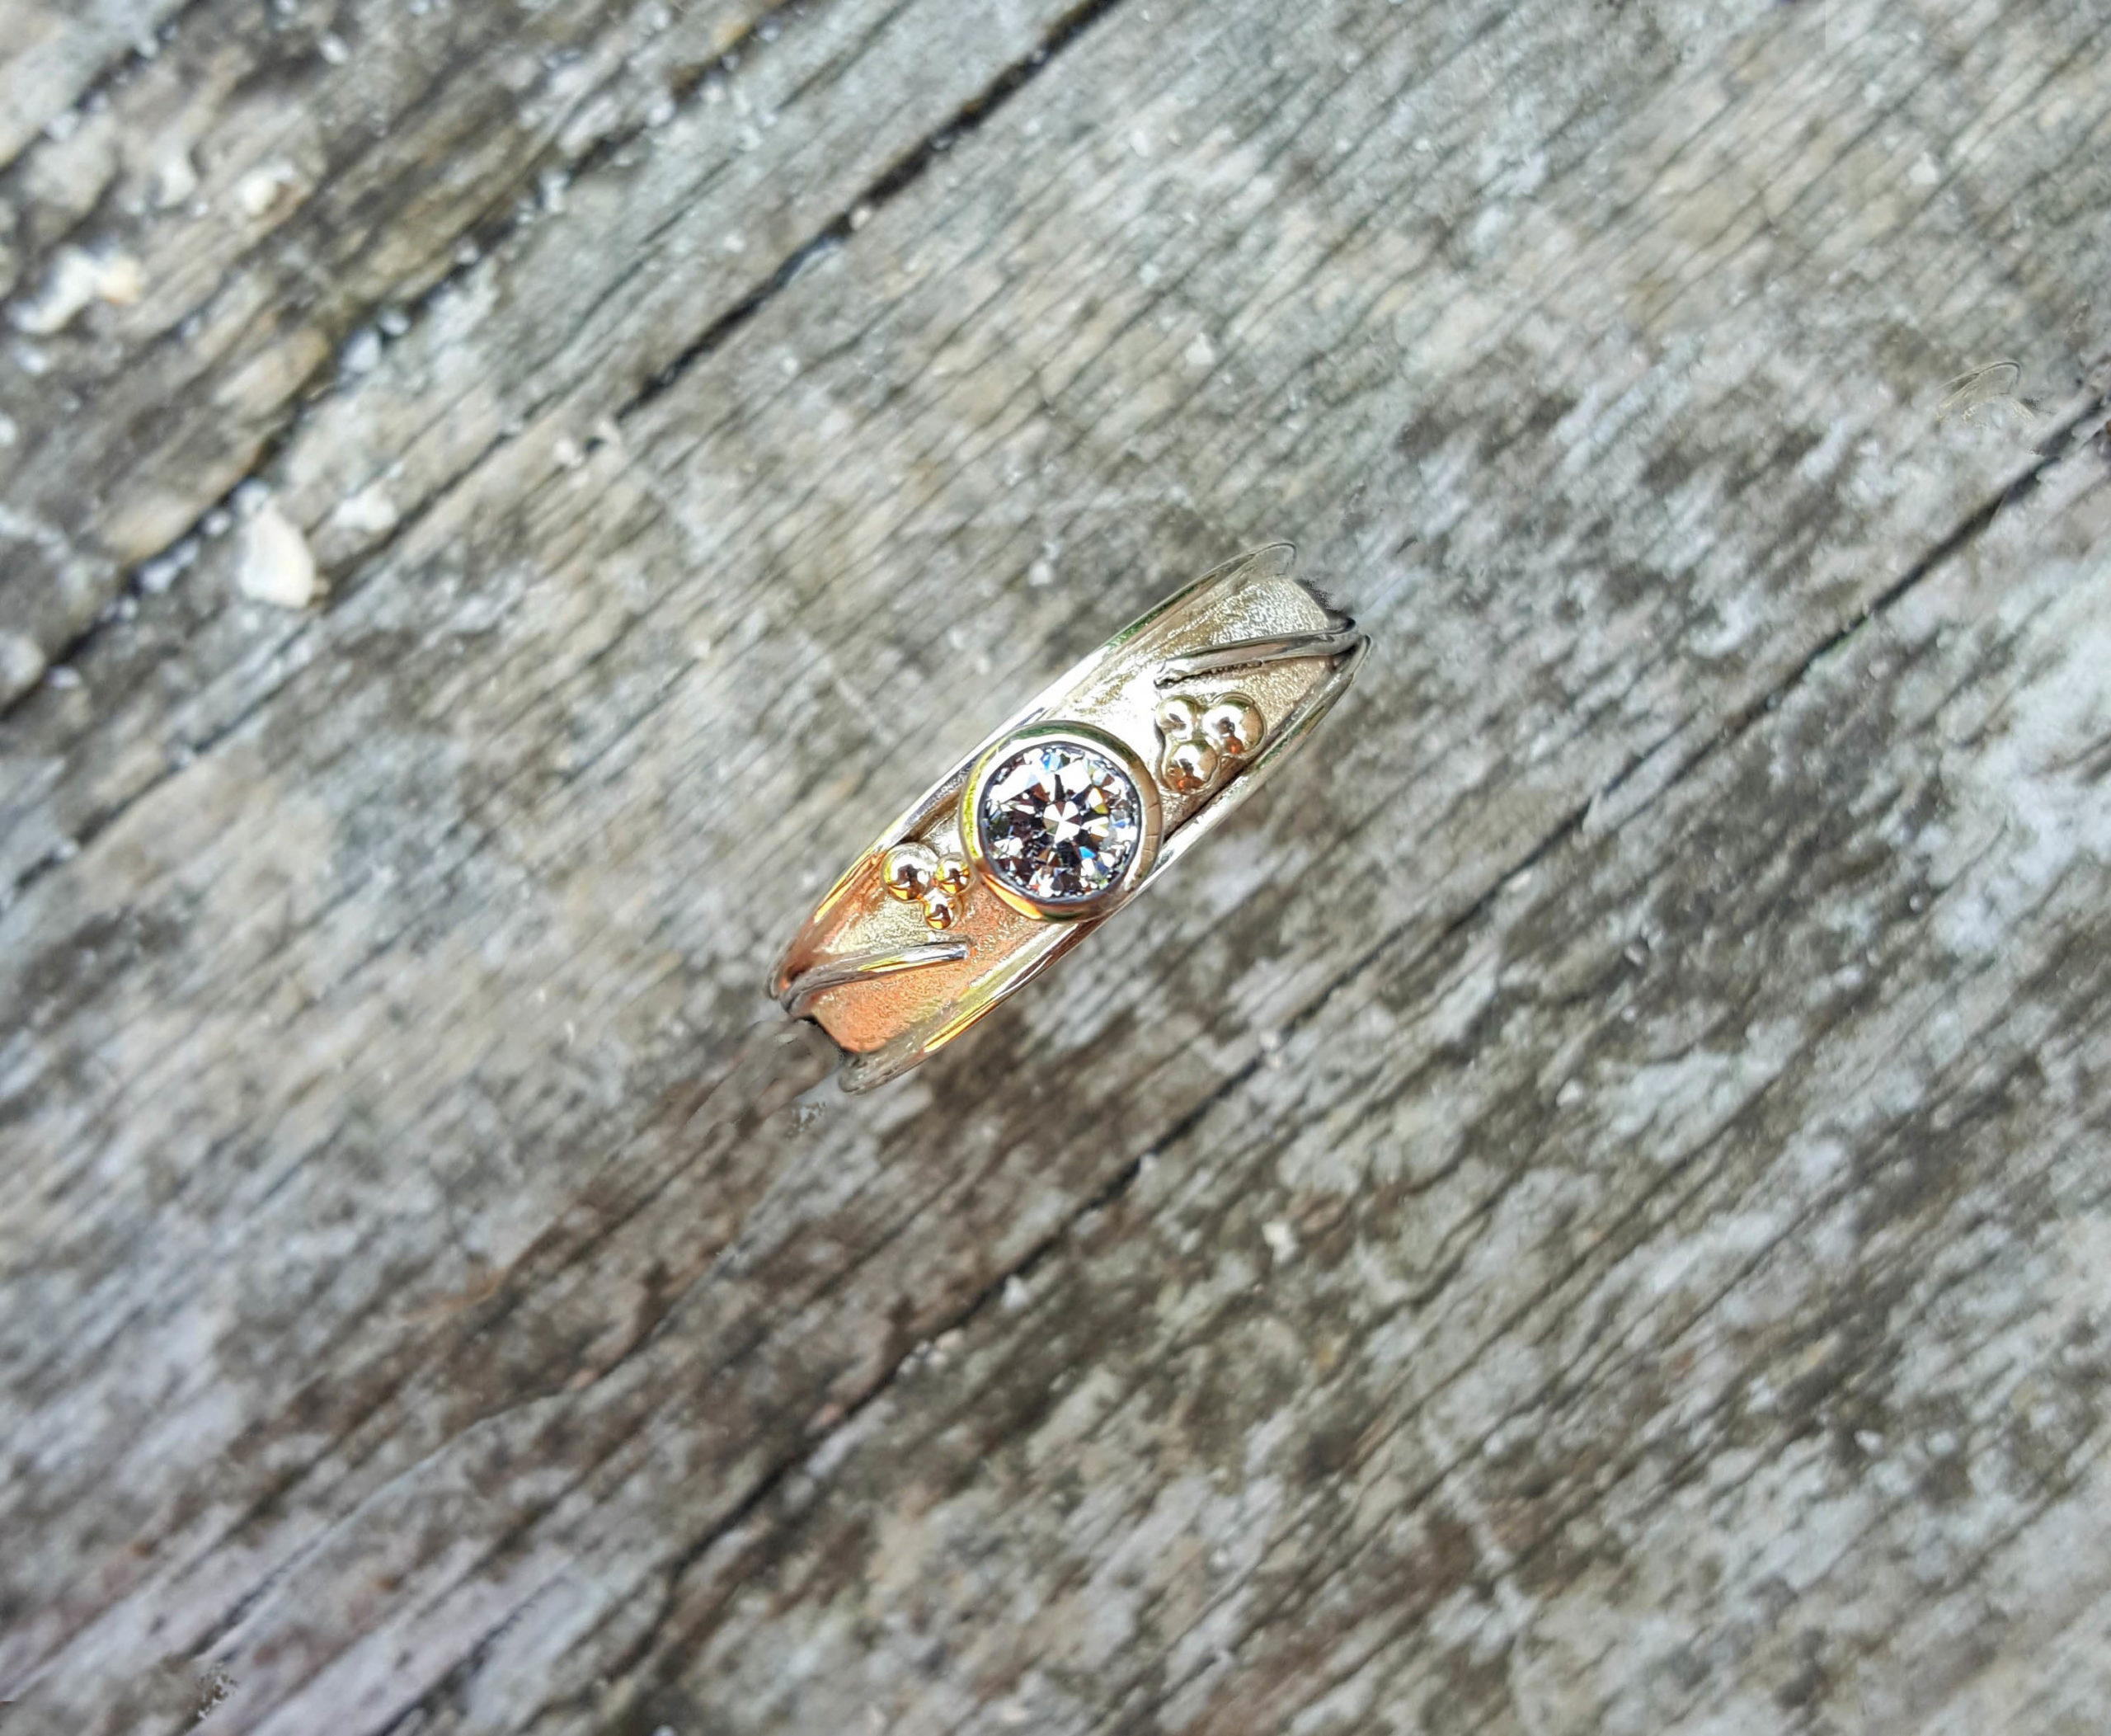 Park Road Jewellery, Bespoke Handmade Diamond Engagement Wedding Ring 18ct Yellow Gold Platinum Personalized Ring